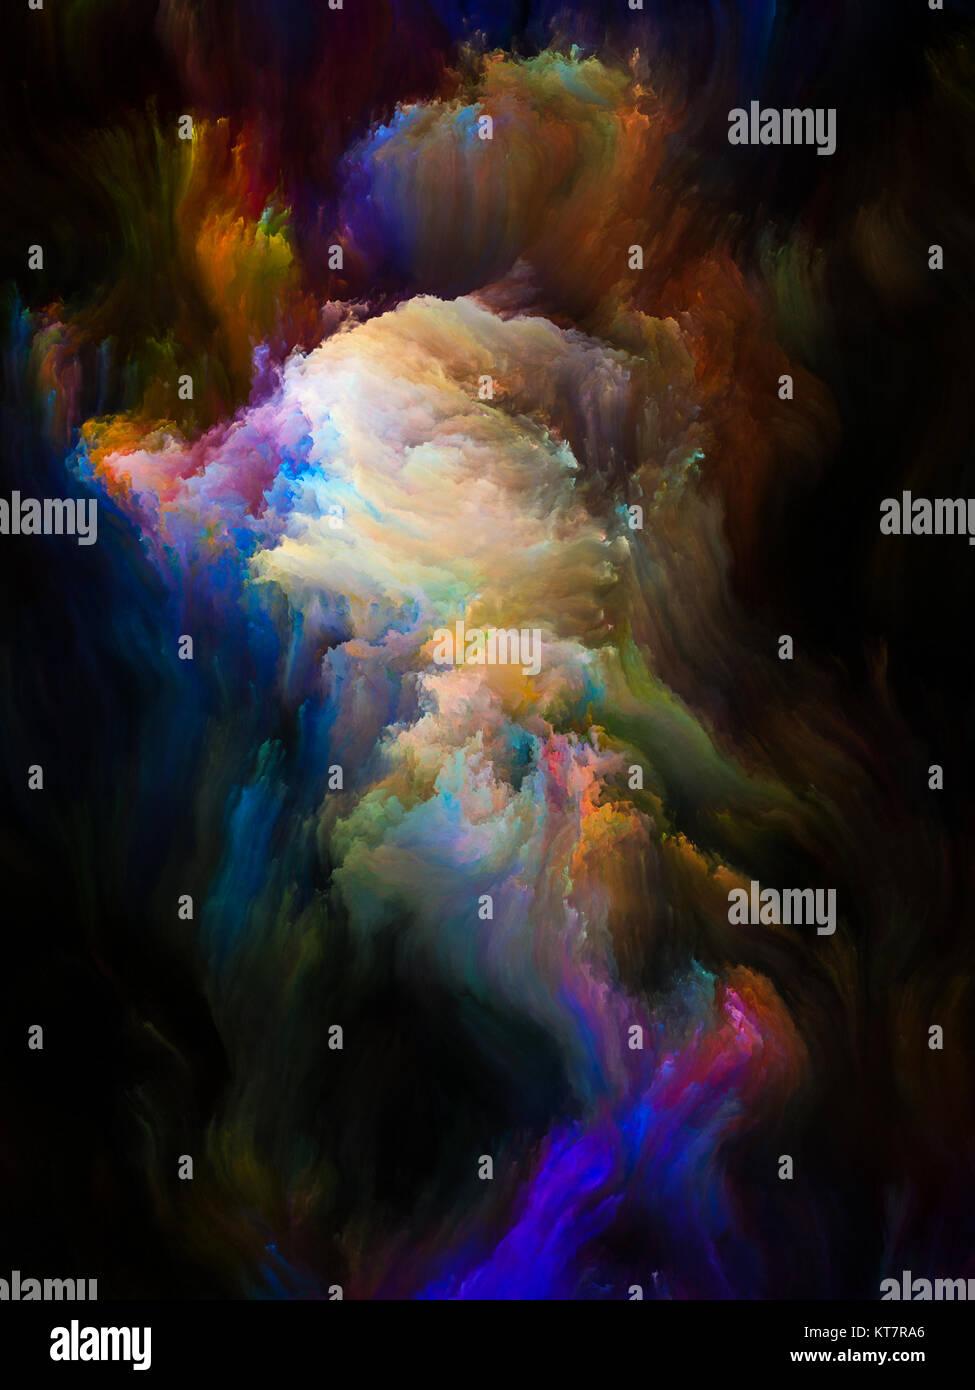 Colorful Fractal Brush - Stock Image